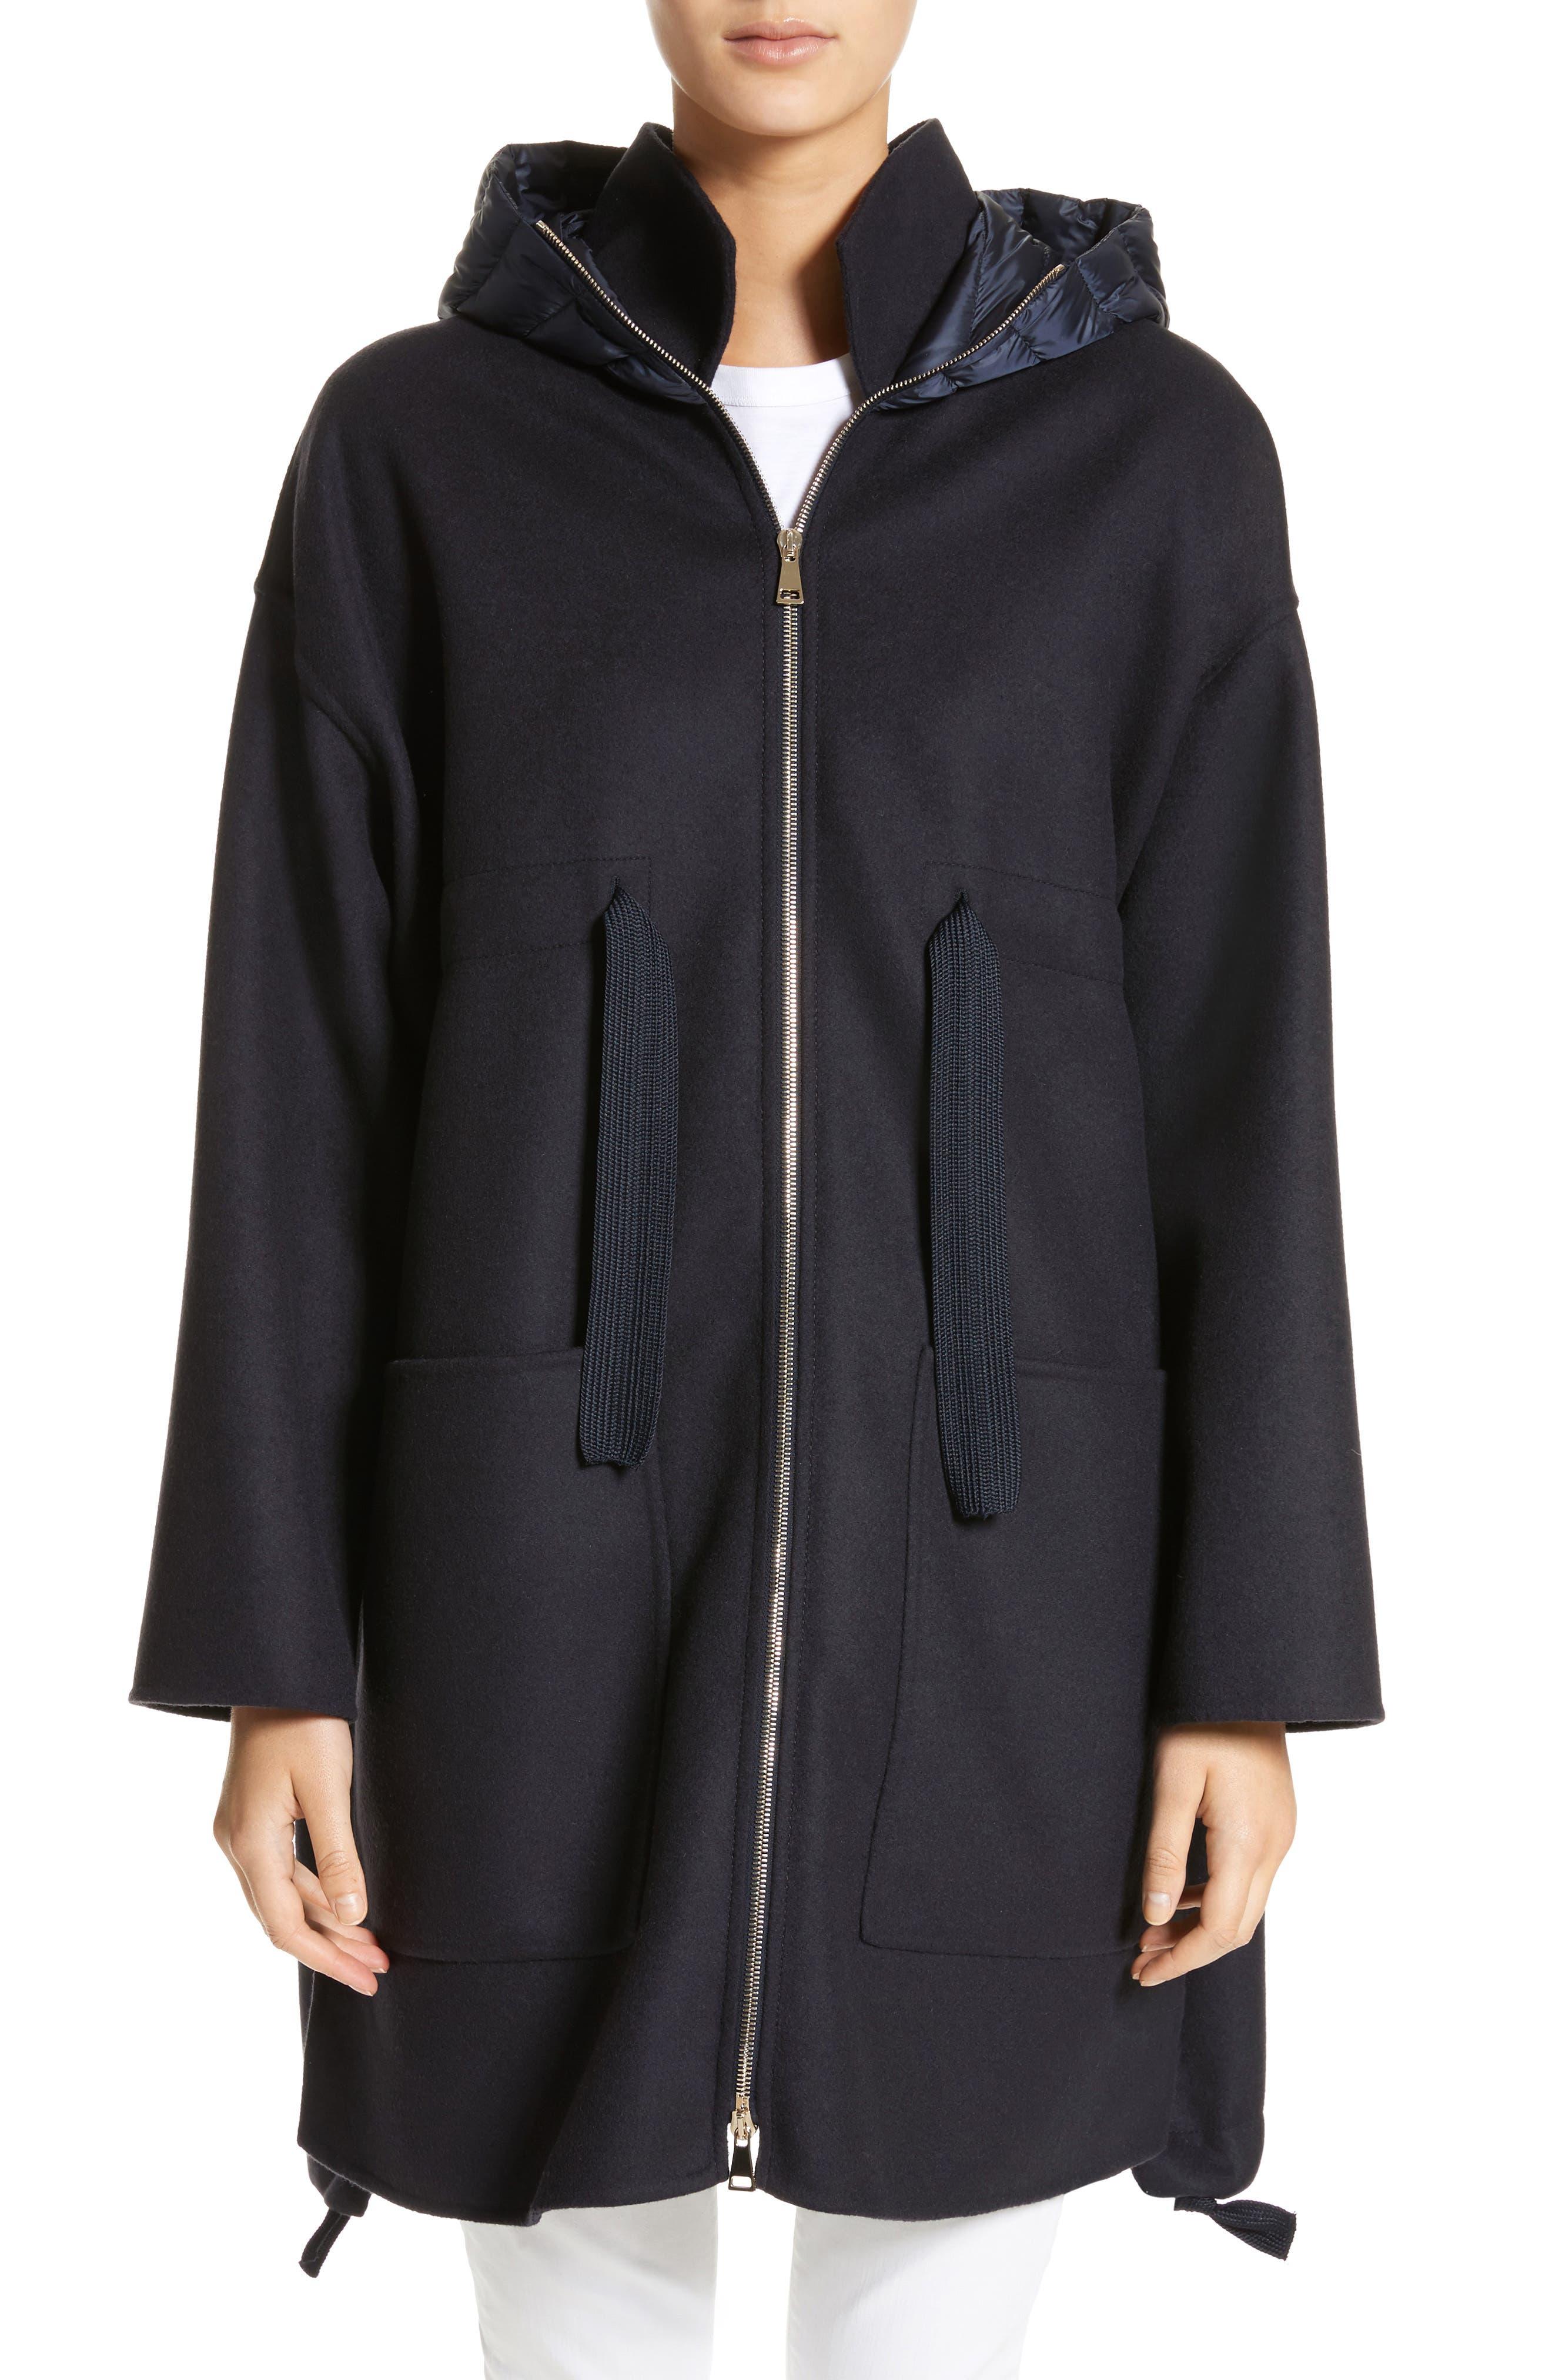 Grenat Wool & Cashmere Hooded Jacket,                         Main,                         color, 419